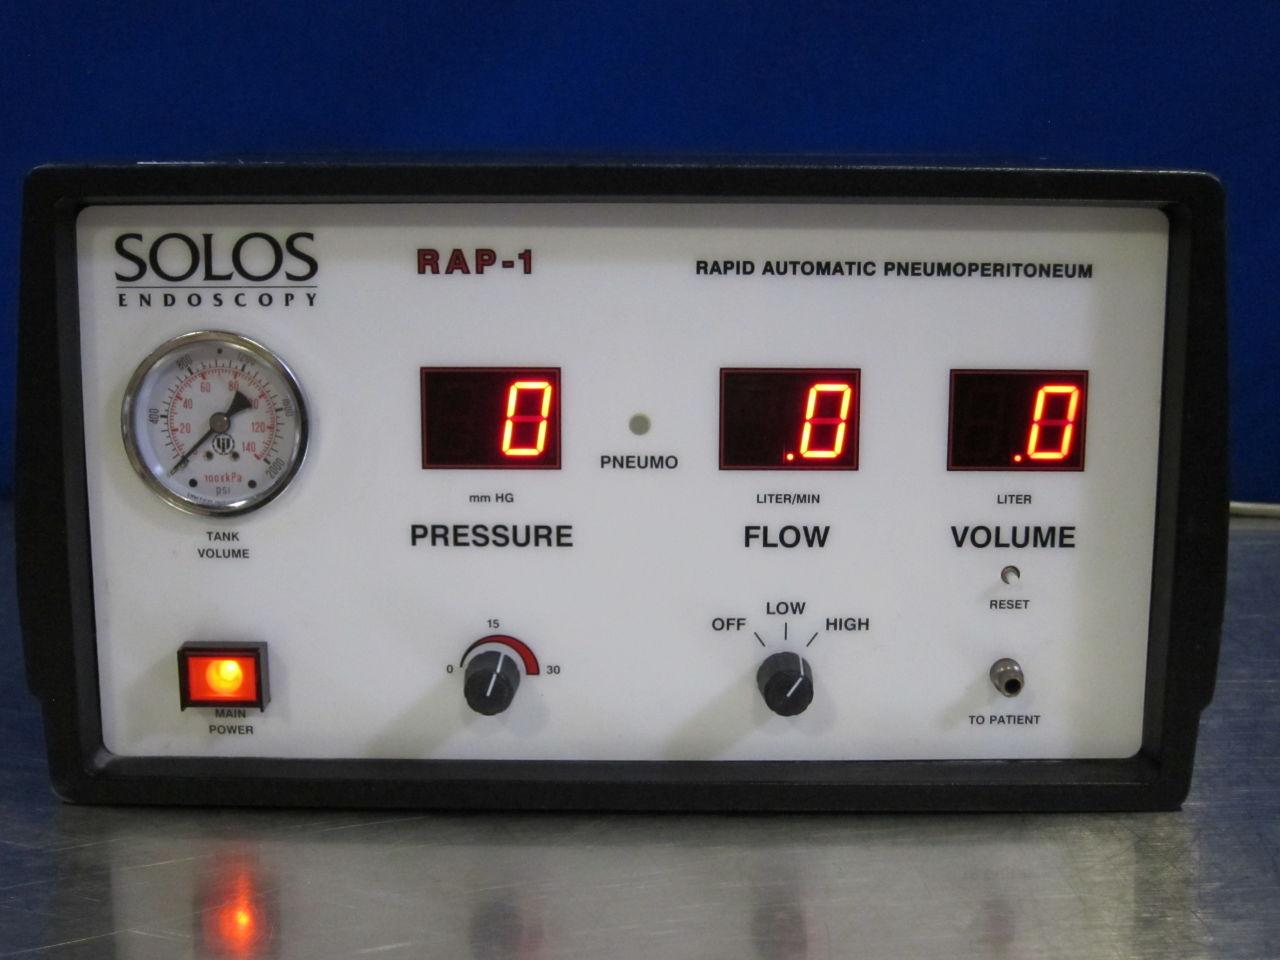 SOLOS Rap-1 Insufflator